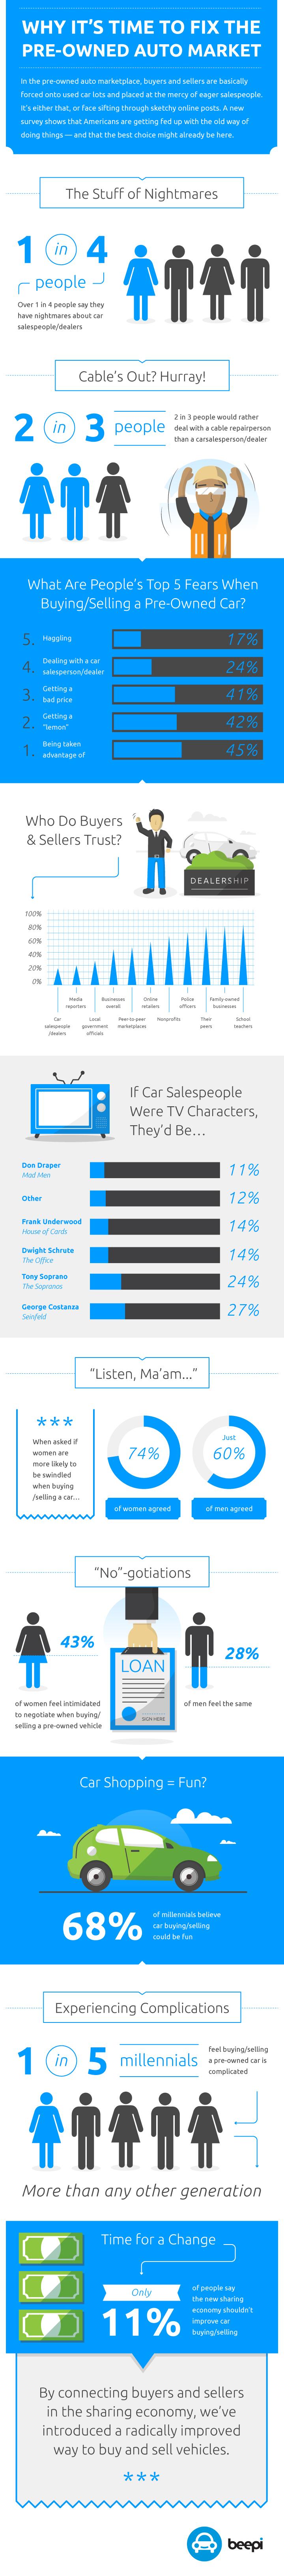 Beepi preowned auto market infographic design